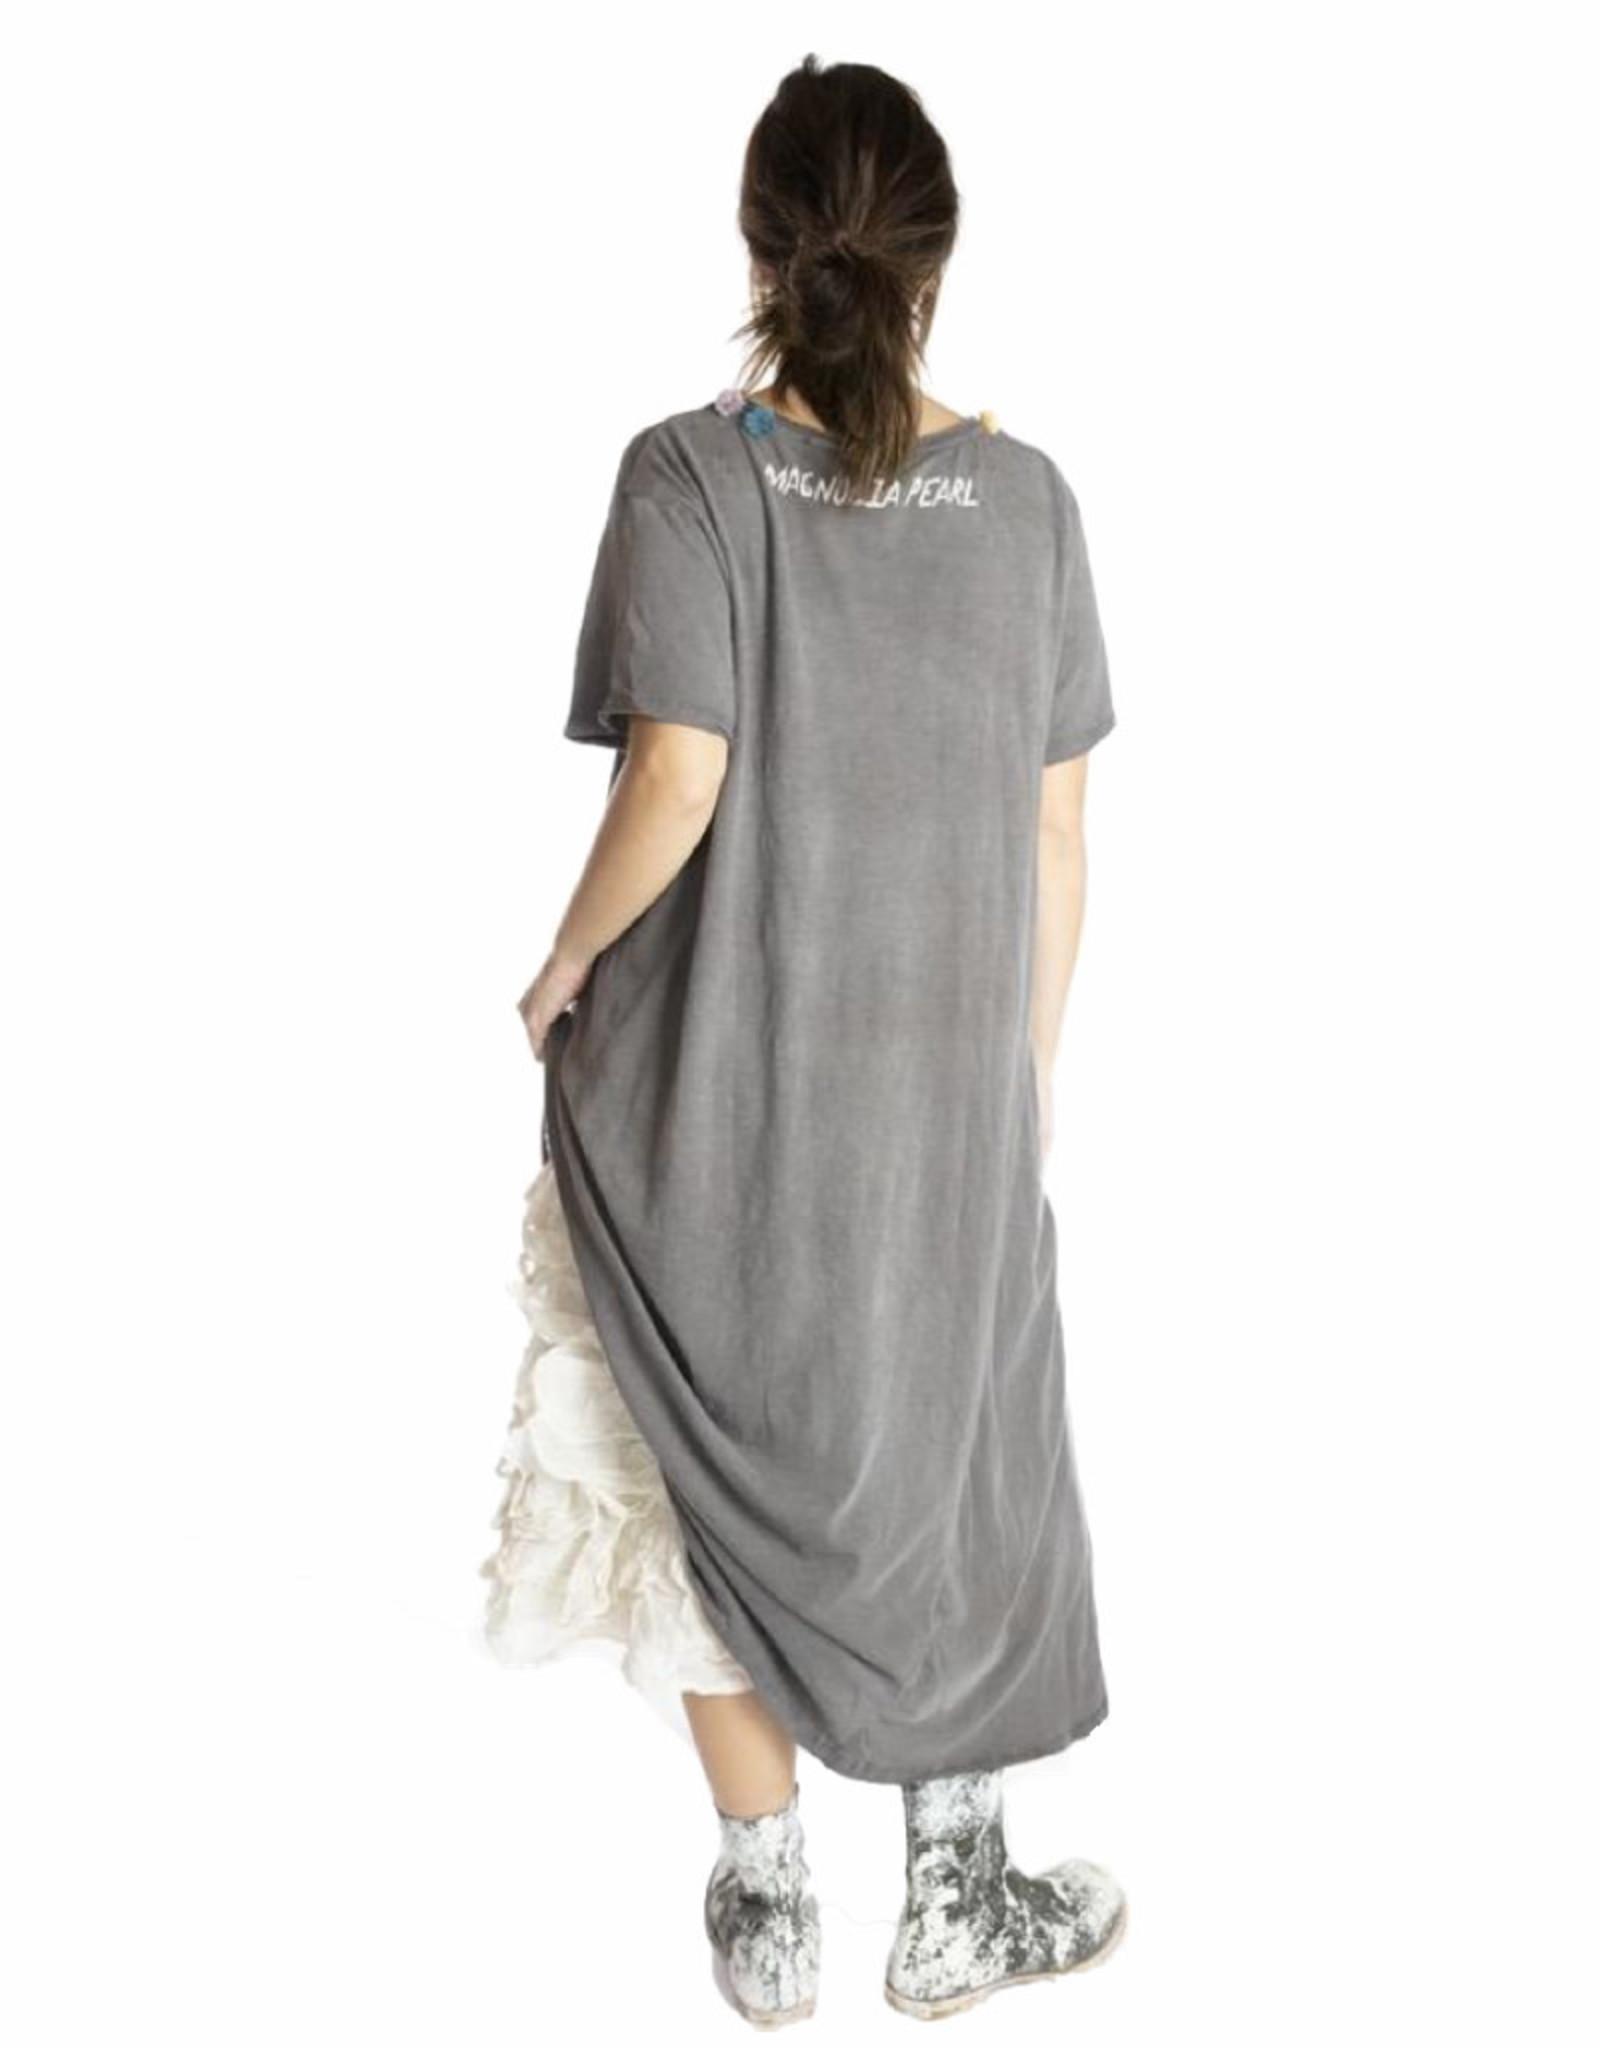 Magnolia Pearl Dress 699 (Ozzy, O/S)